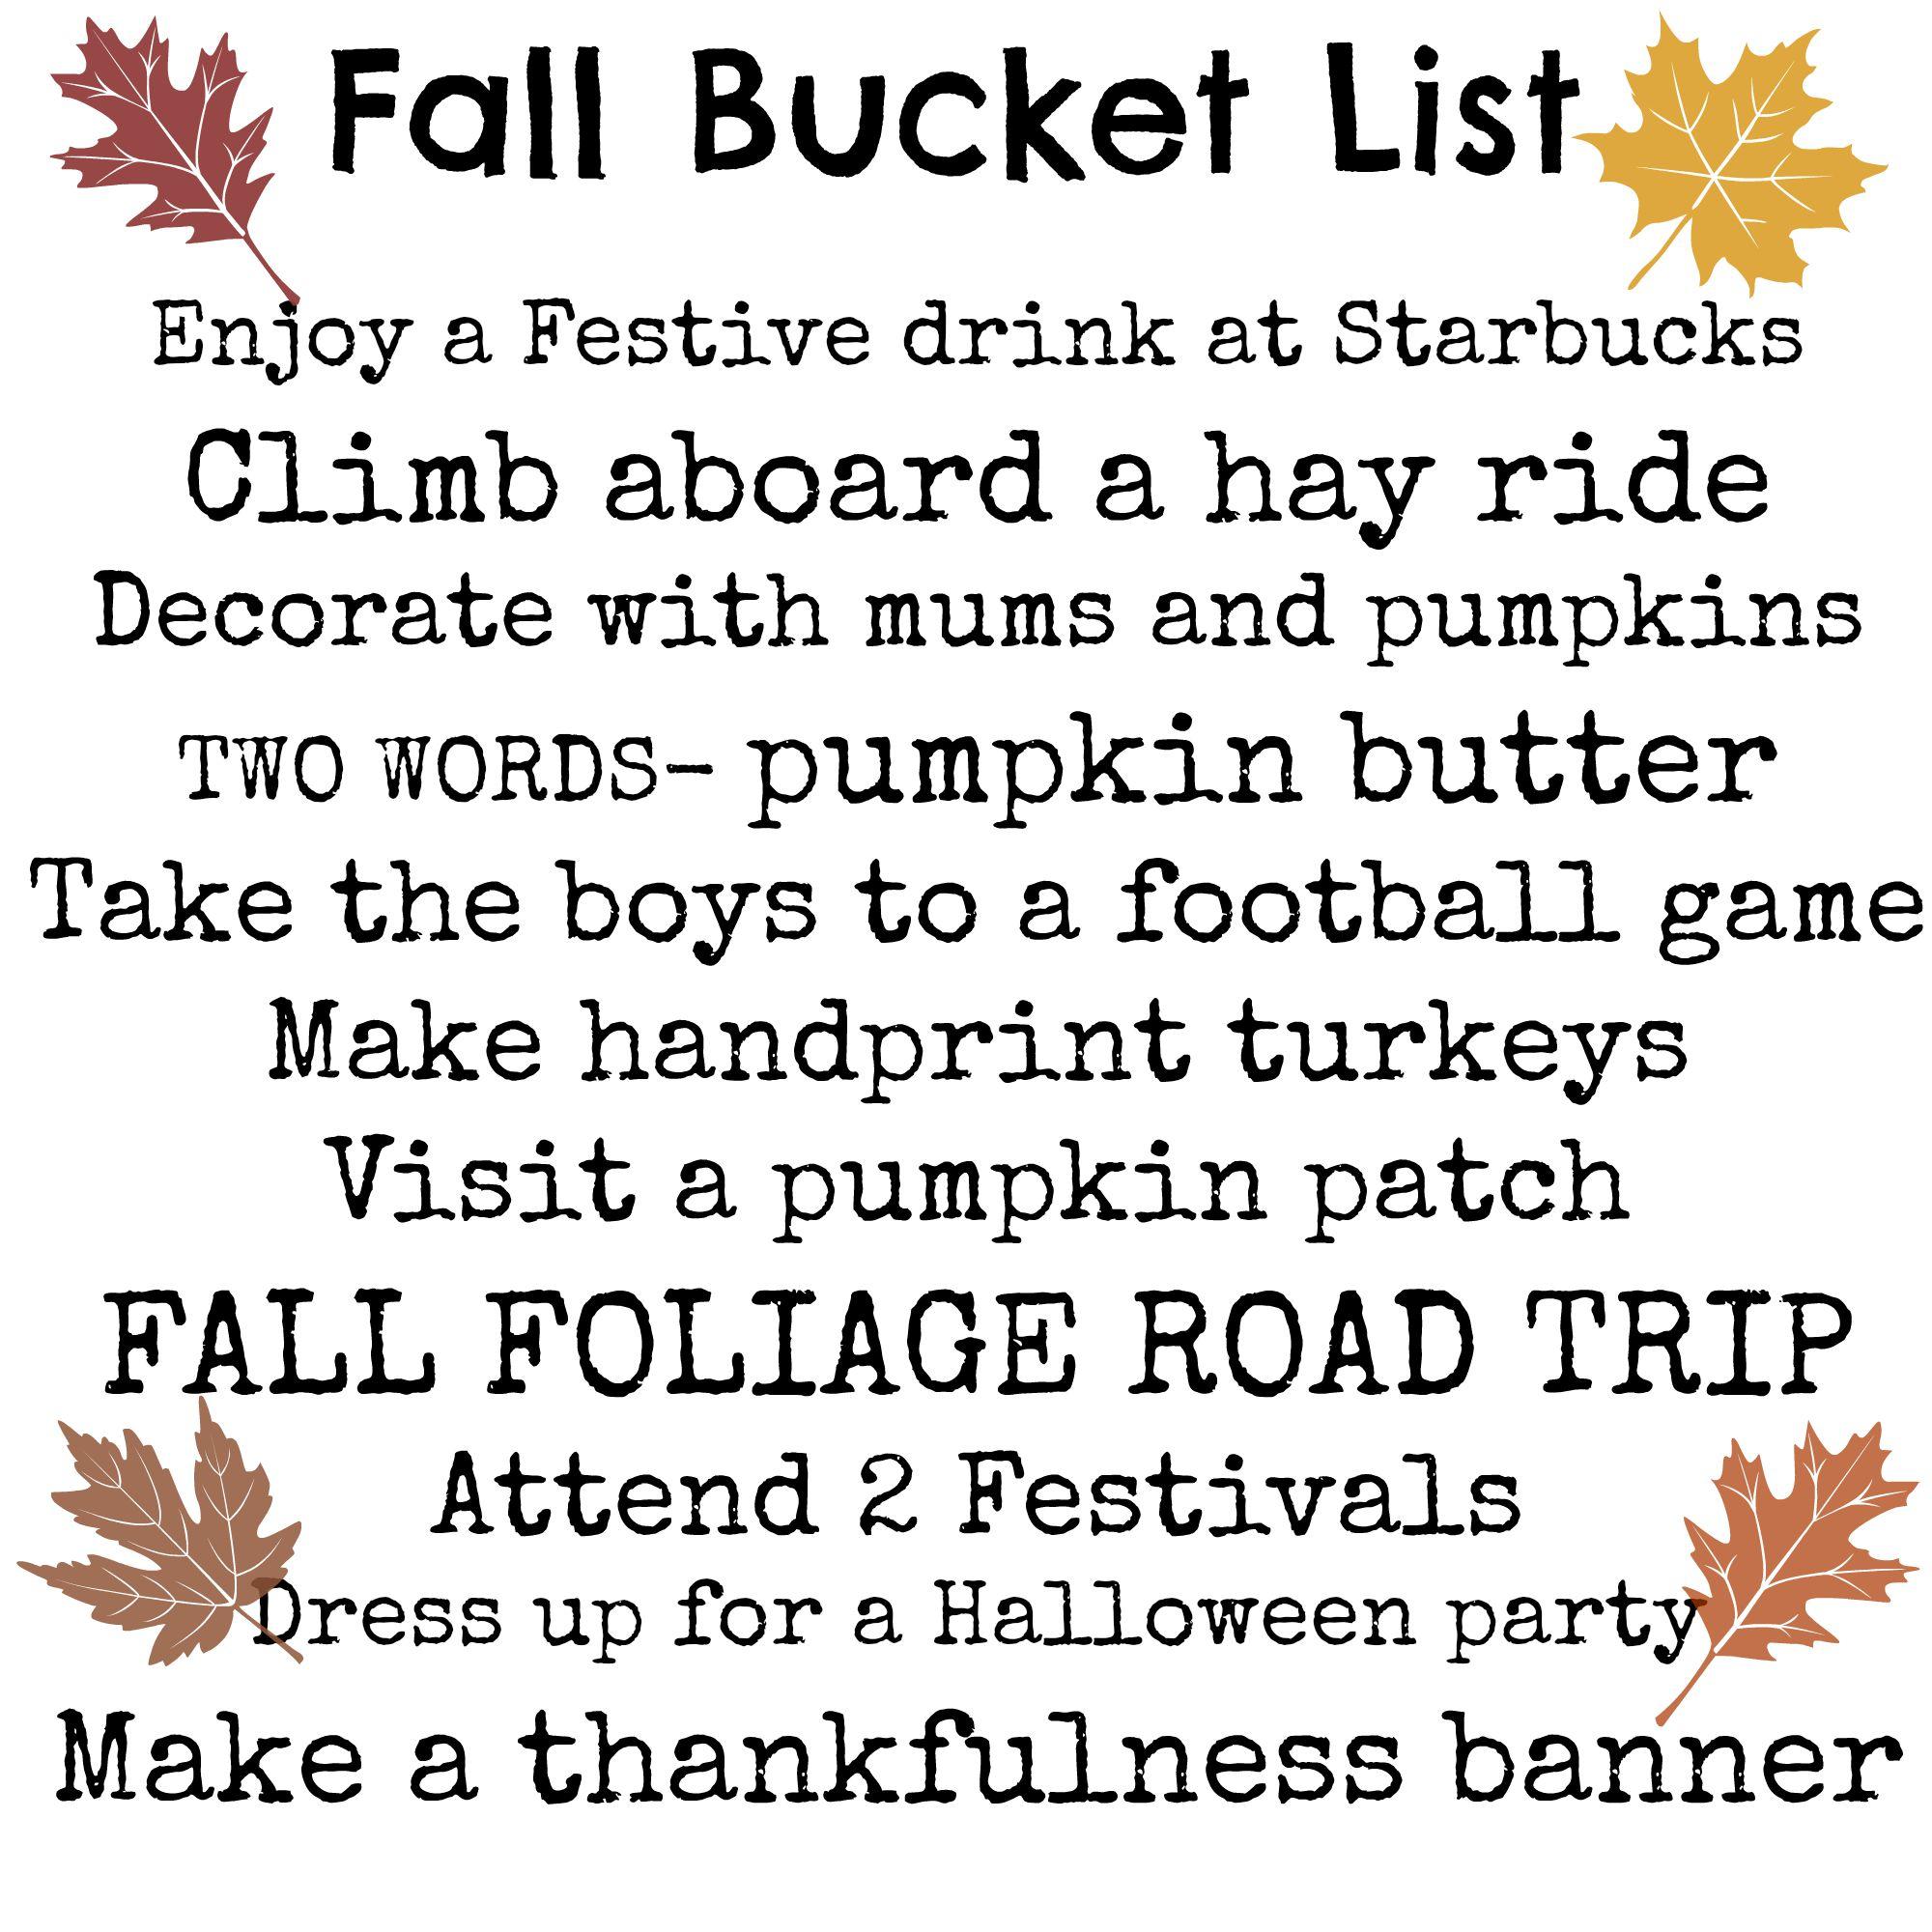 Fall Bucket List 2